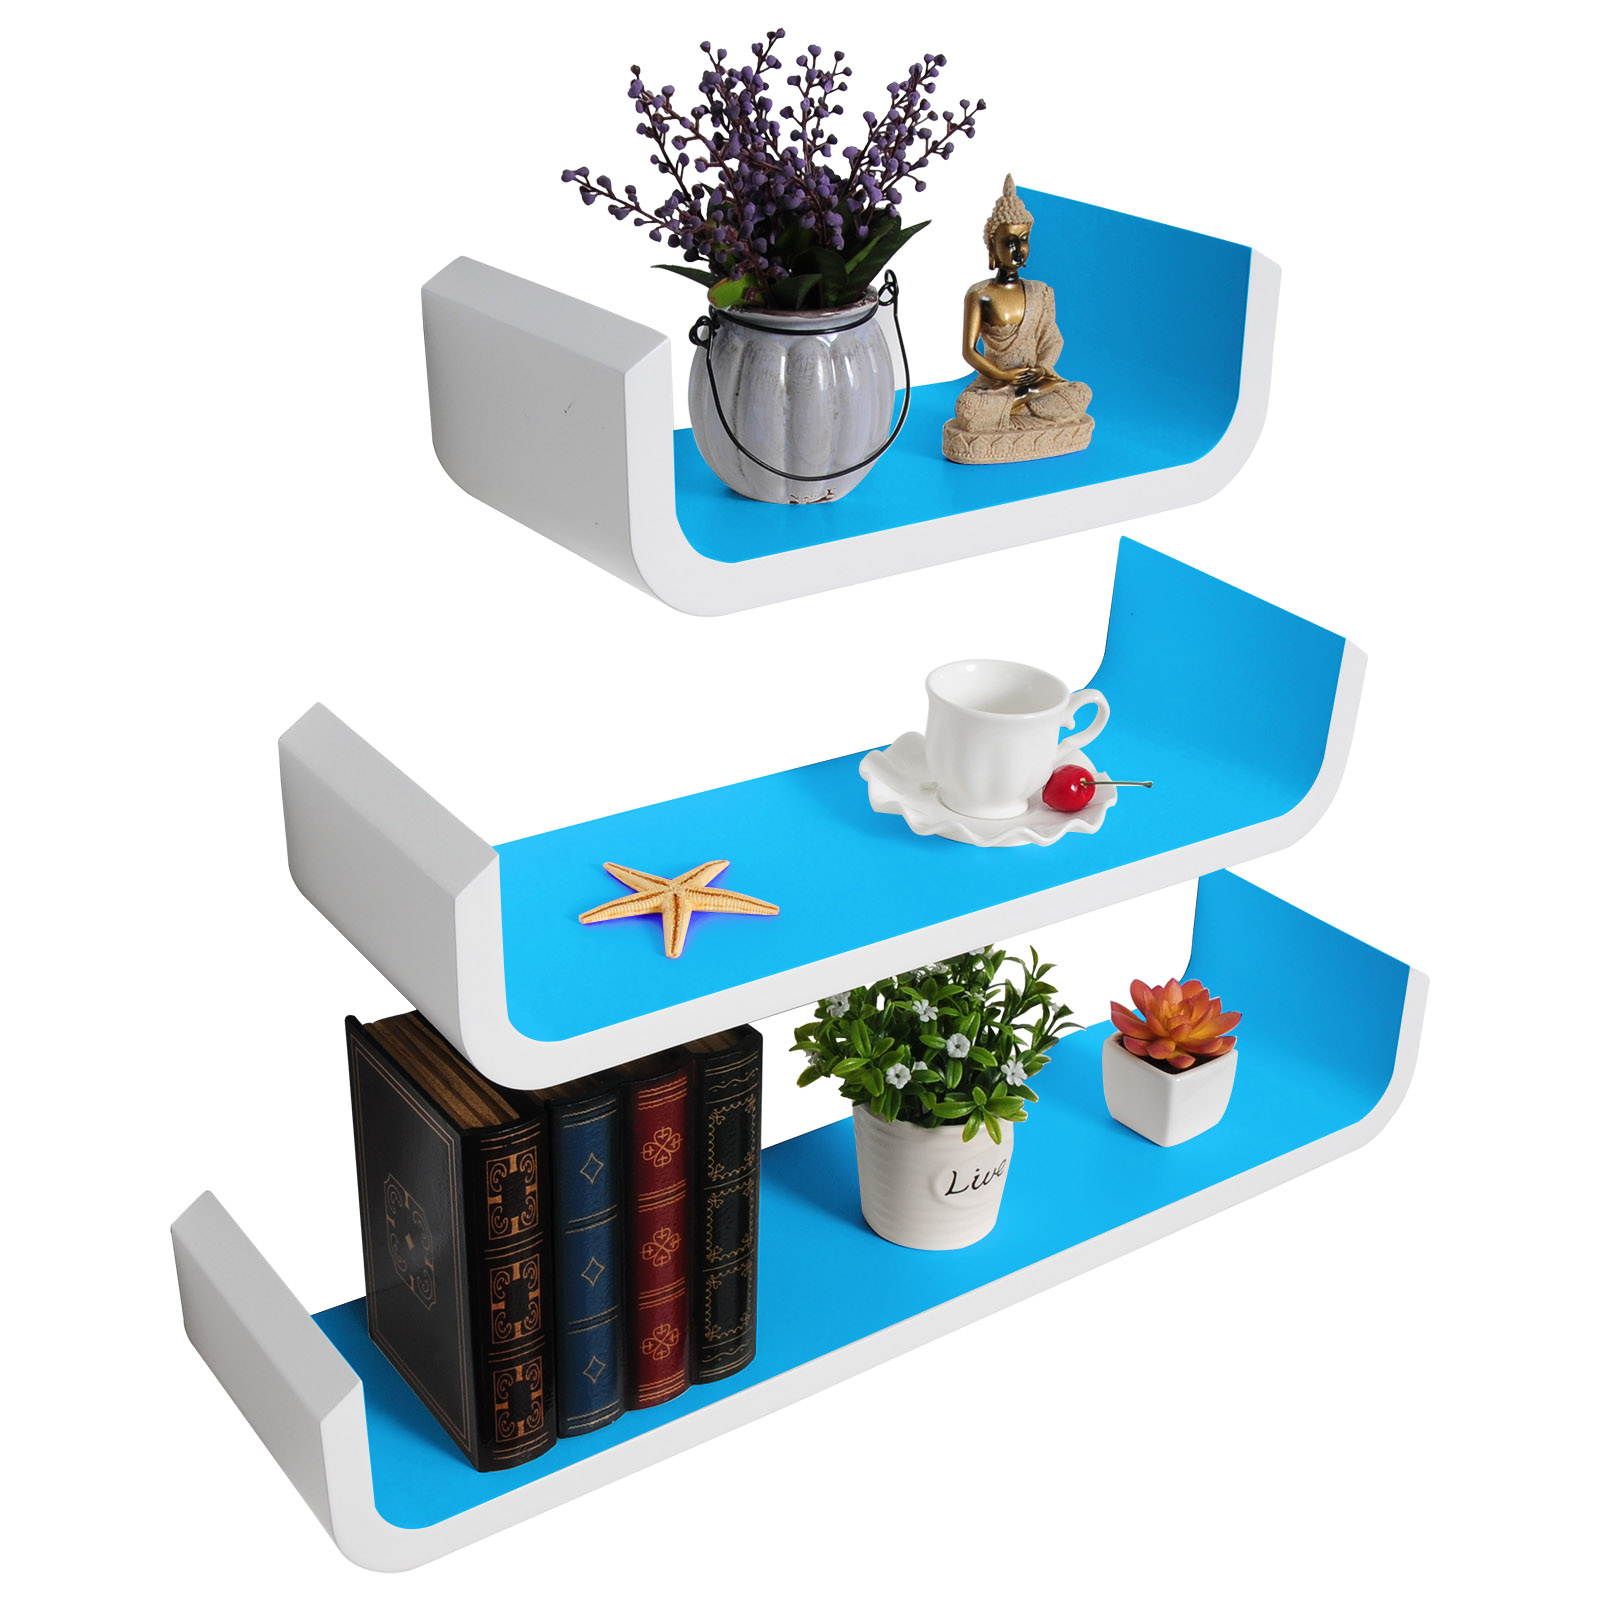 etag re murale tablette en mdf tag re de rangement pour cd dvd livres f119 ebay. Black Bedroom Furniture Sets. Home Design Ideas